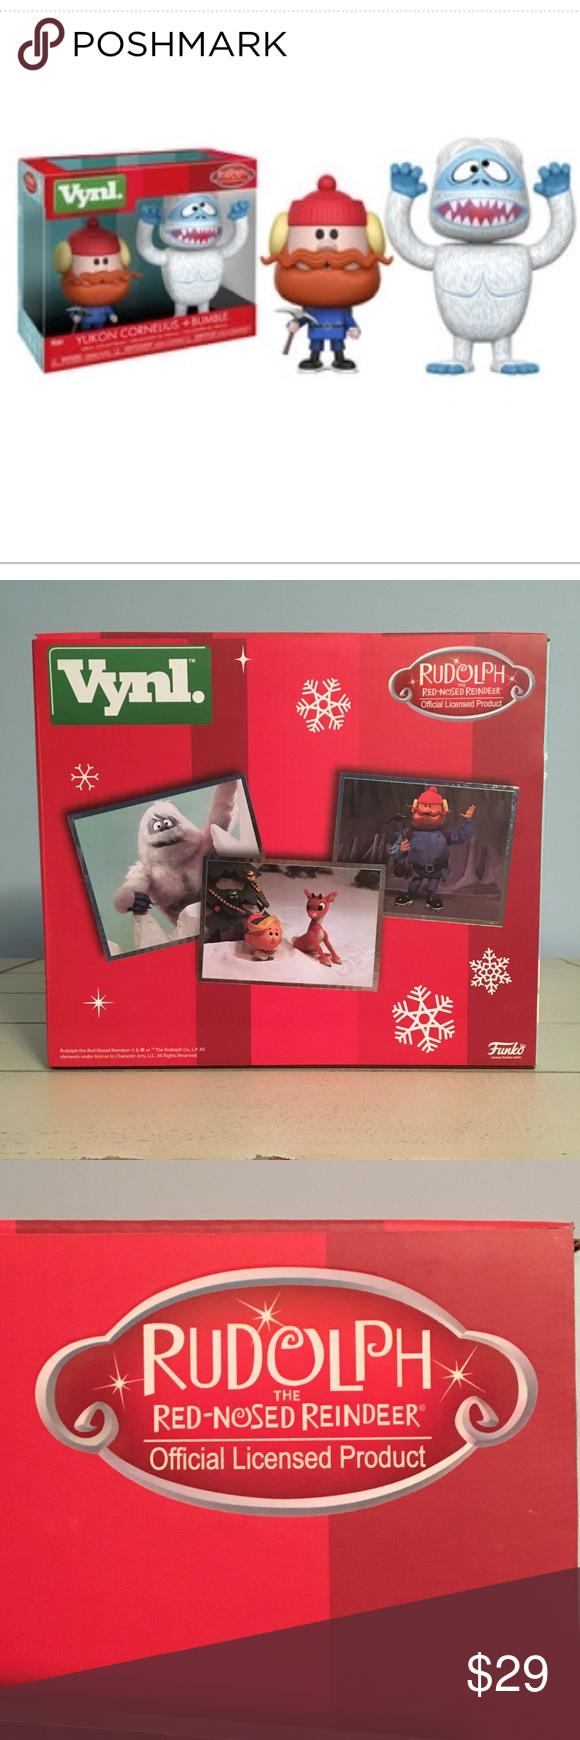 FUNKO VYNL. Rudolph Vinyl Figurines Brand FUNKO VYNL